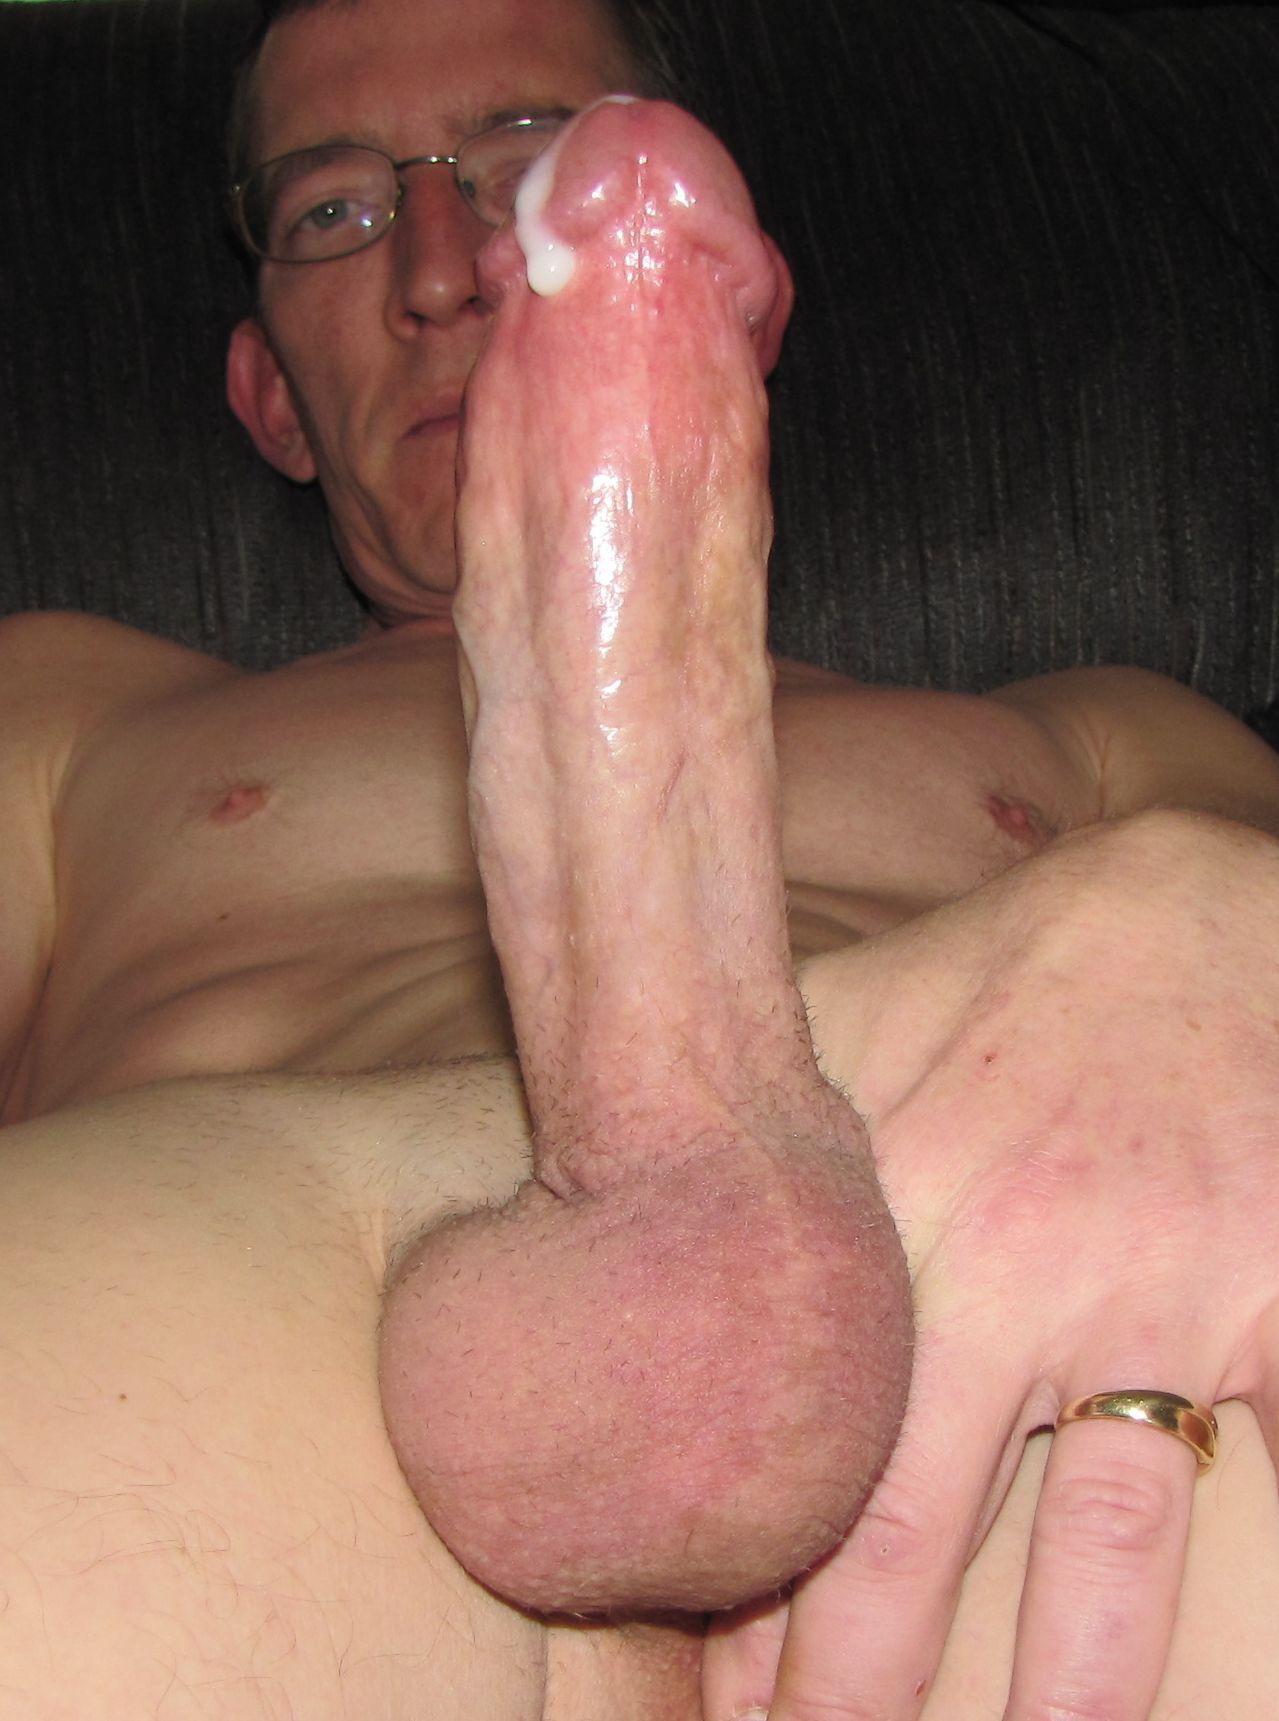 Thomas roberts hot boyfriend nude